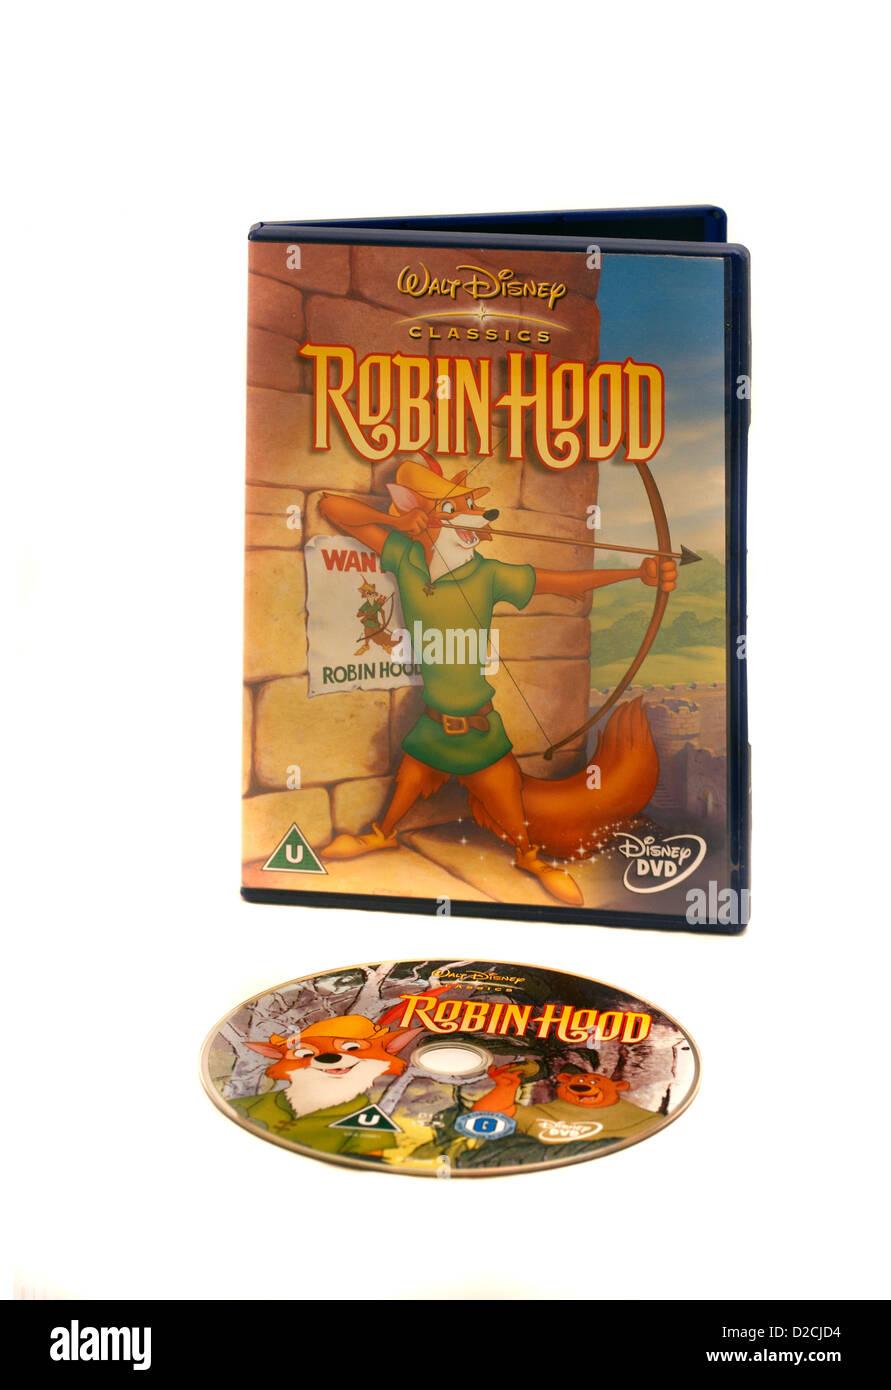 Walt Disney Klassiker Classic Robin Hood Zeichentrickfilm Dvd